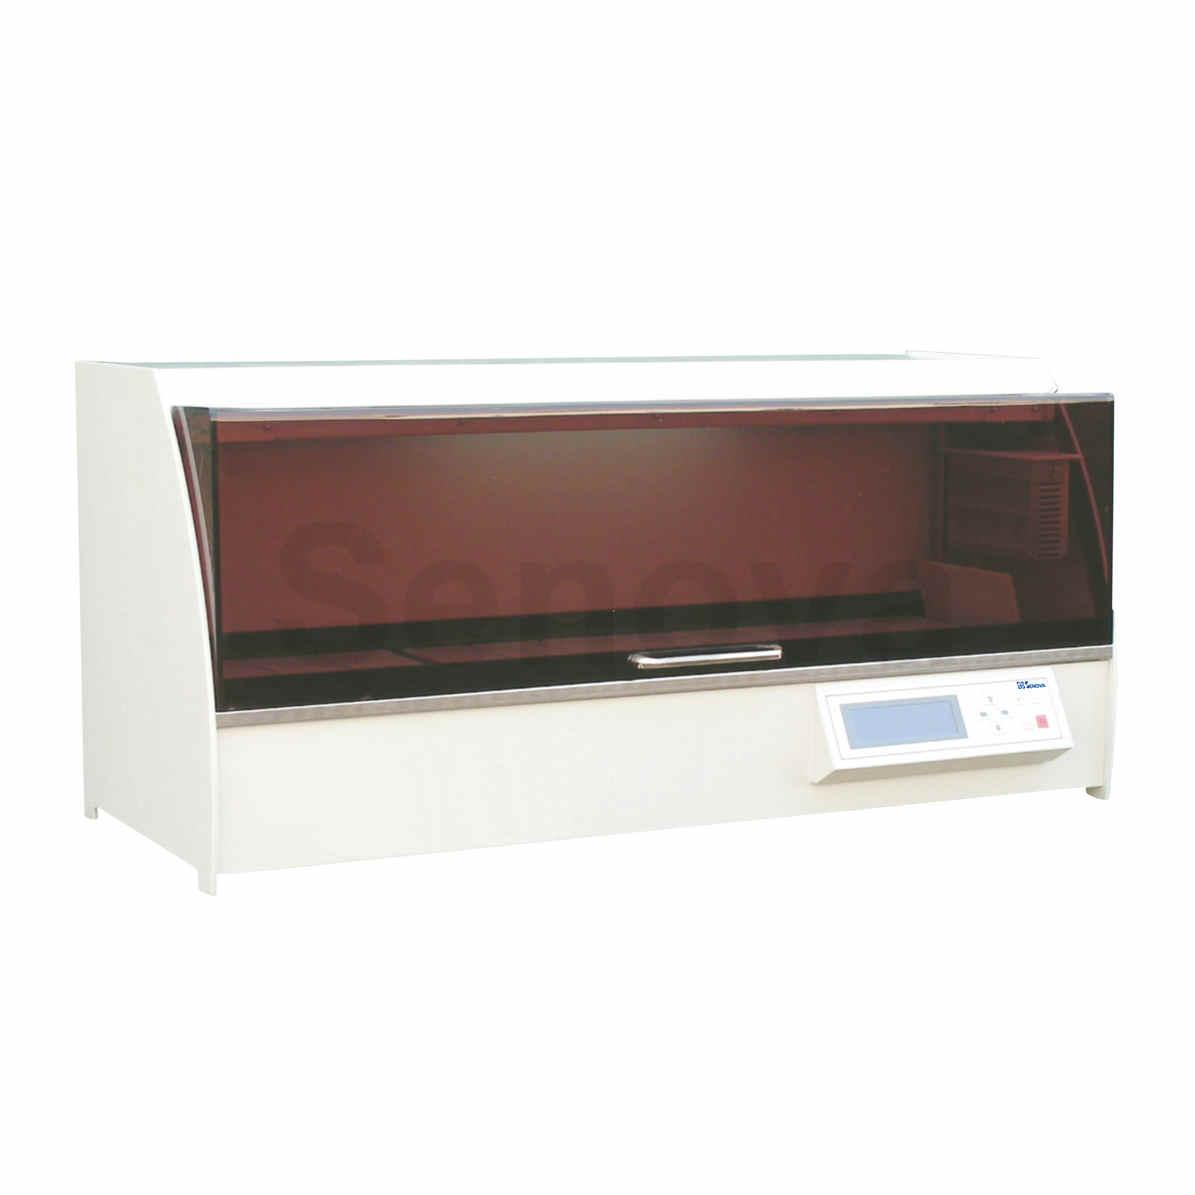 Senova Laboratory Equipment Freeze Dryer Lyophilizer